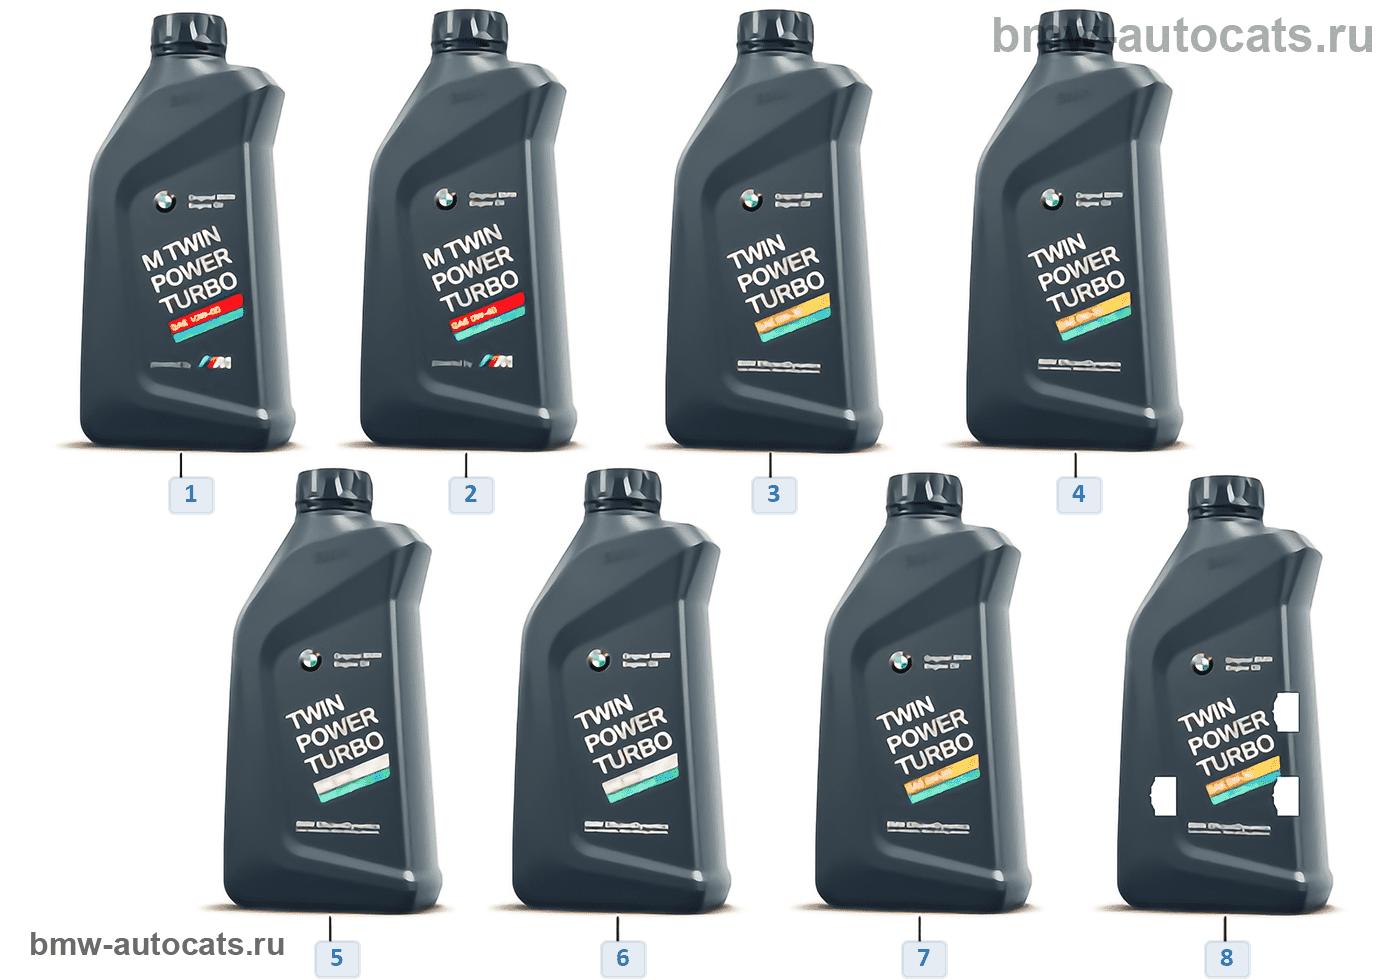 Моторн.масло BMW, прочие рынки